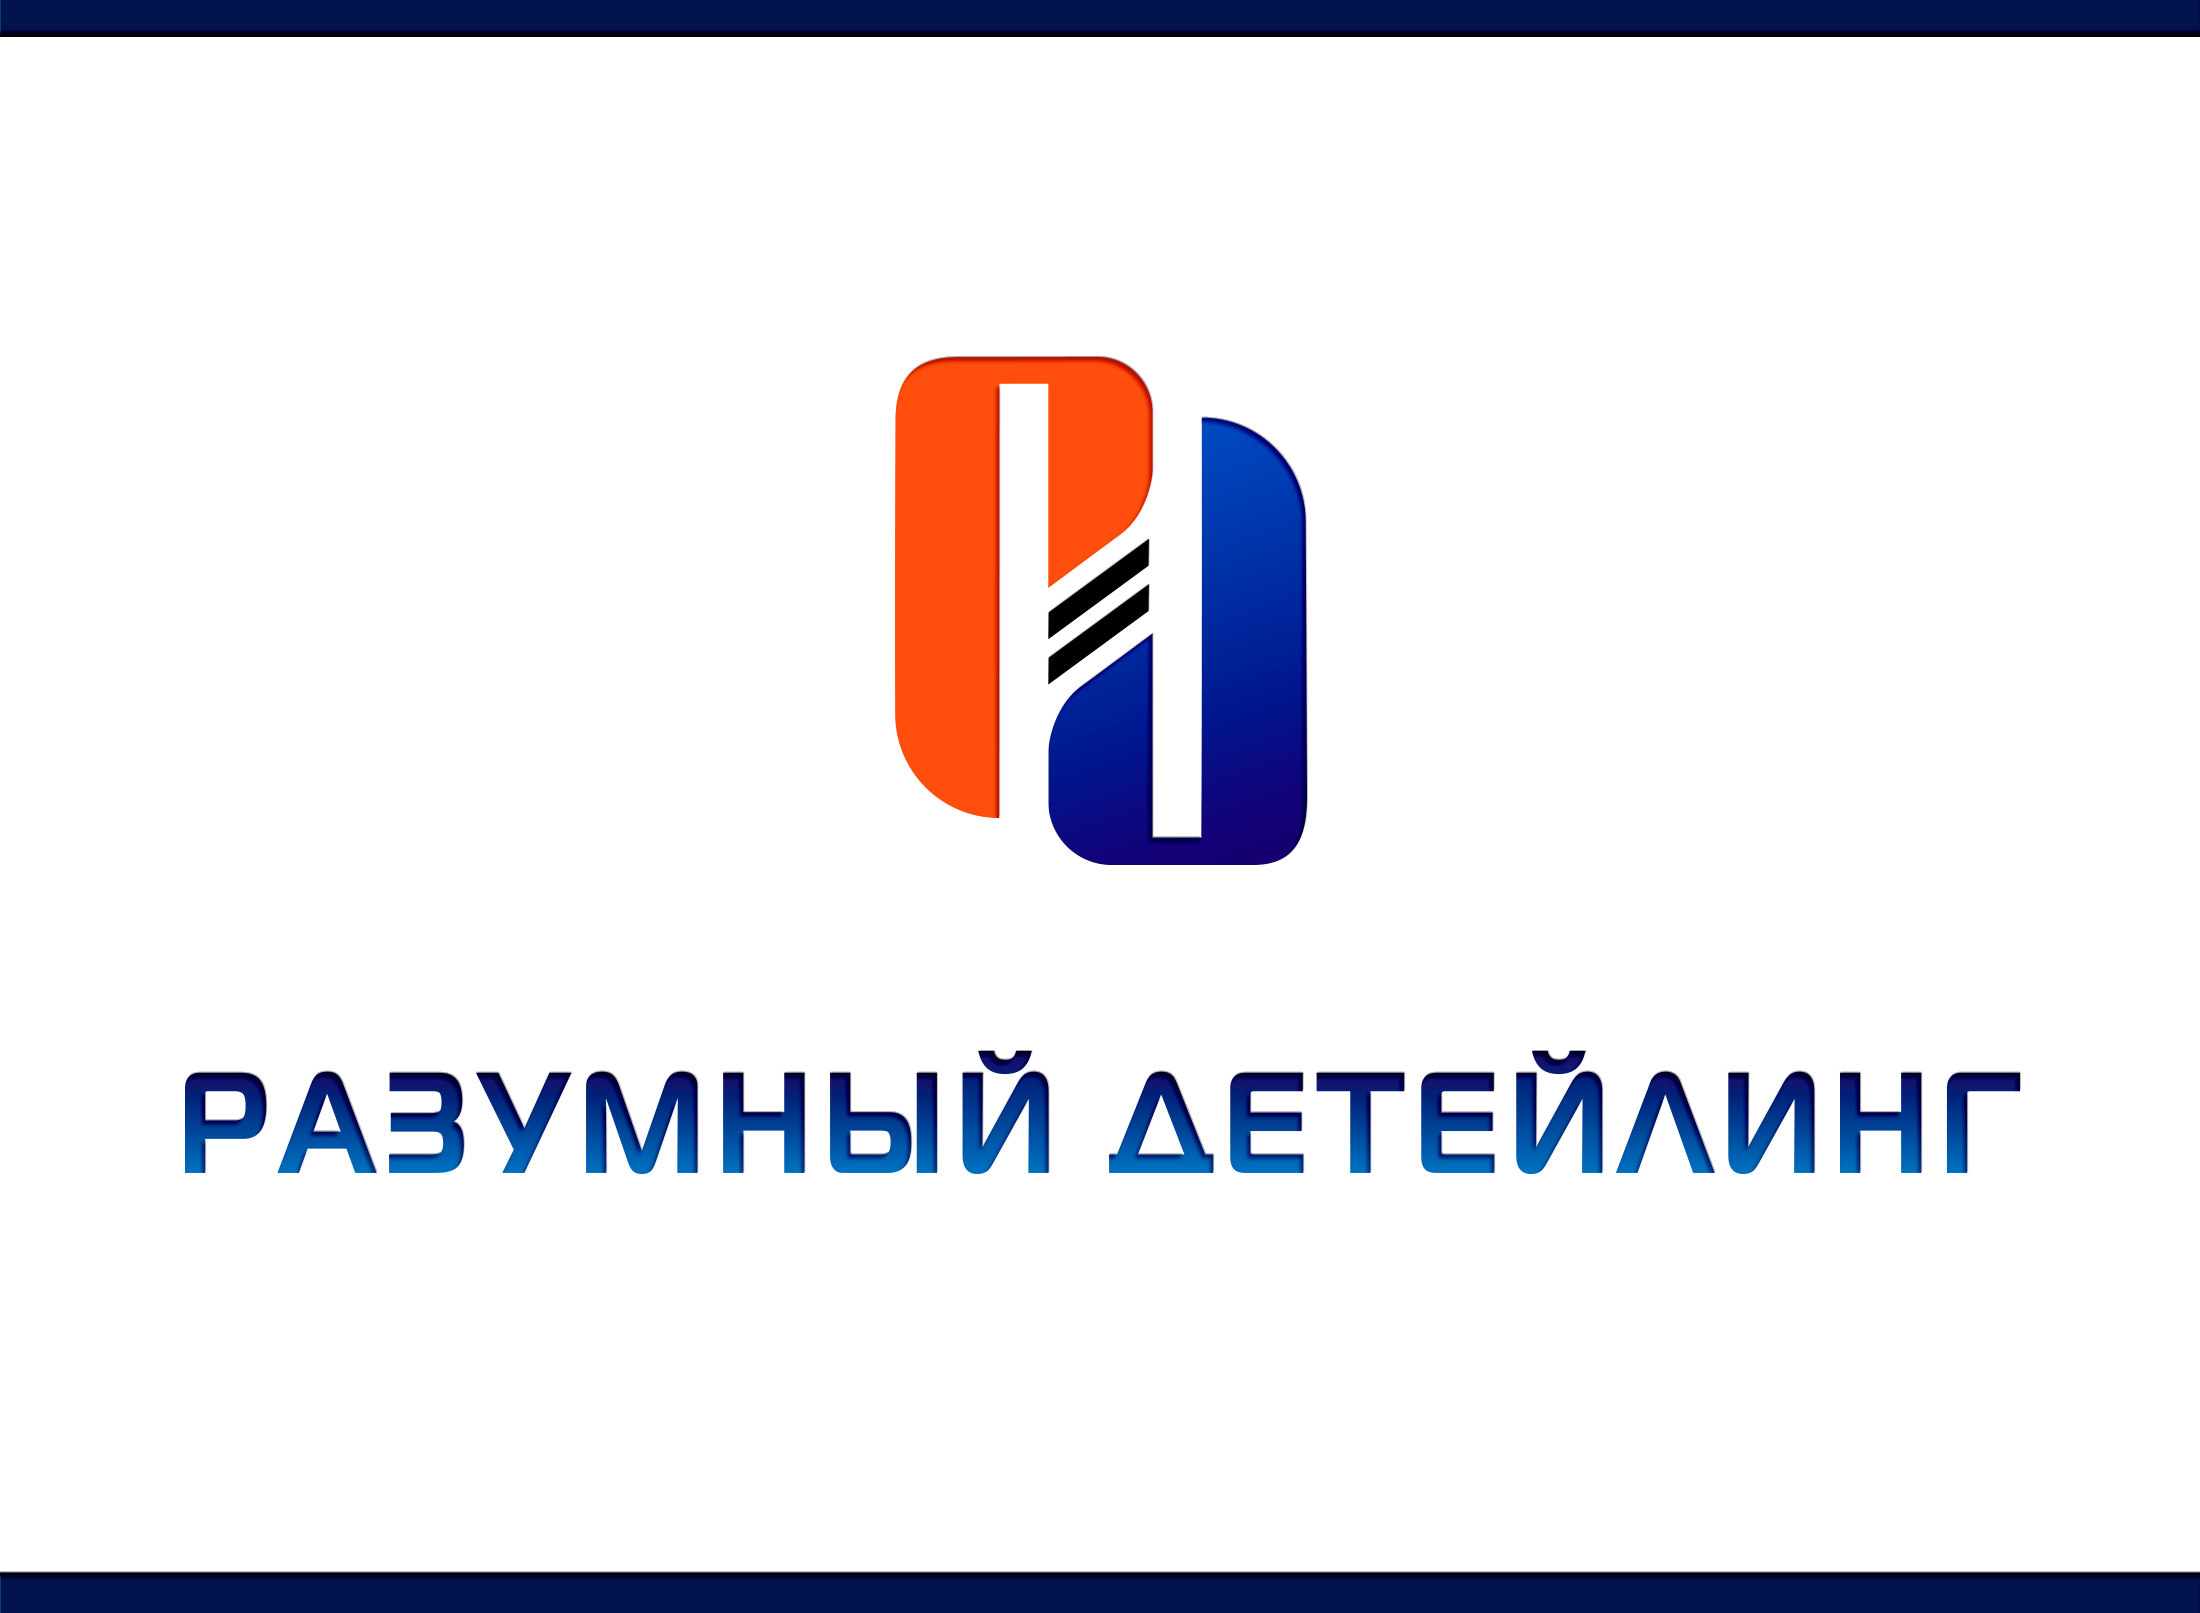 Ребрендинг логотипа  фото f_3825aef68365d8a5.jpg